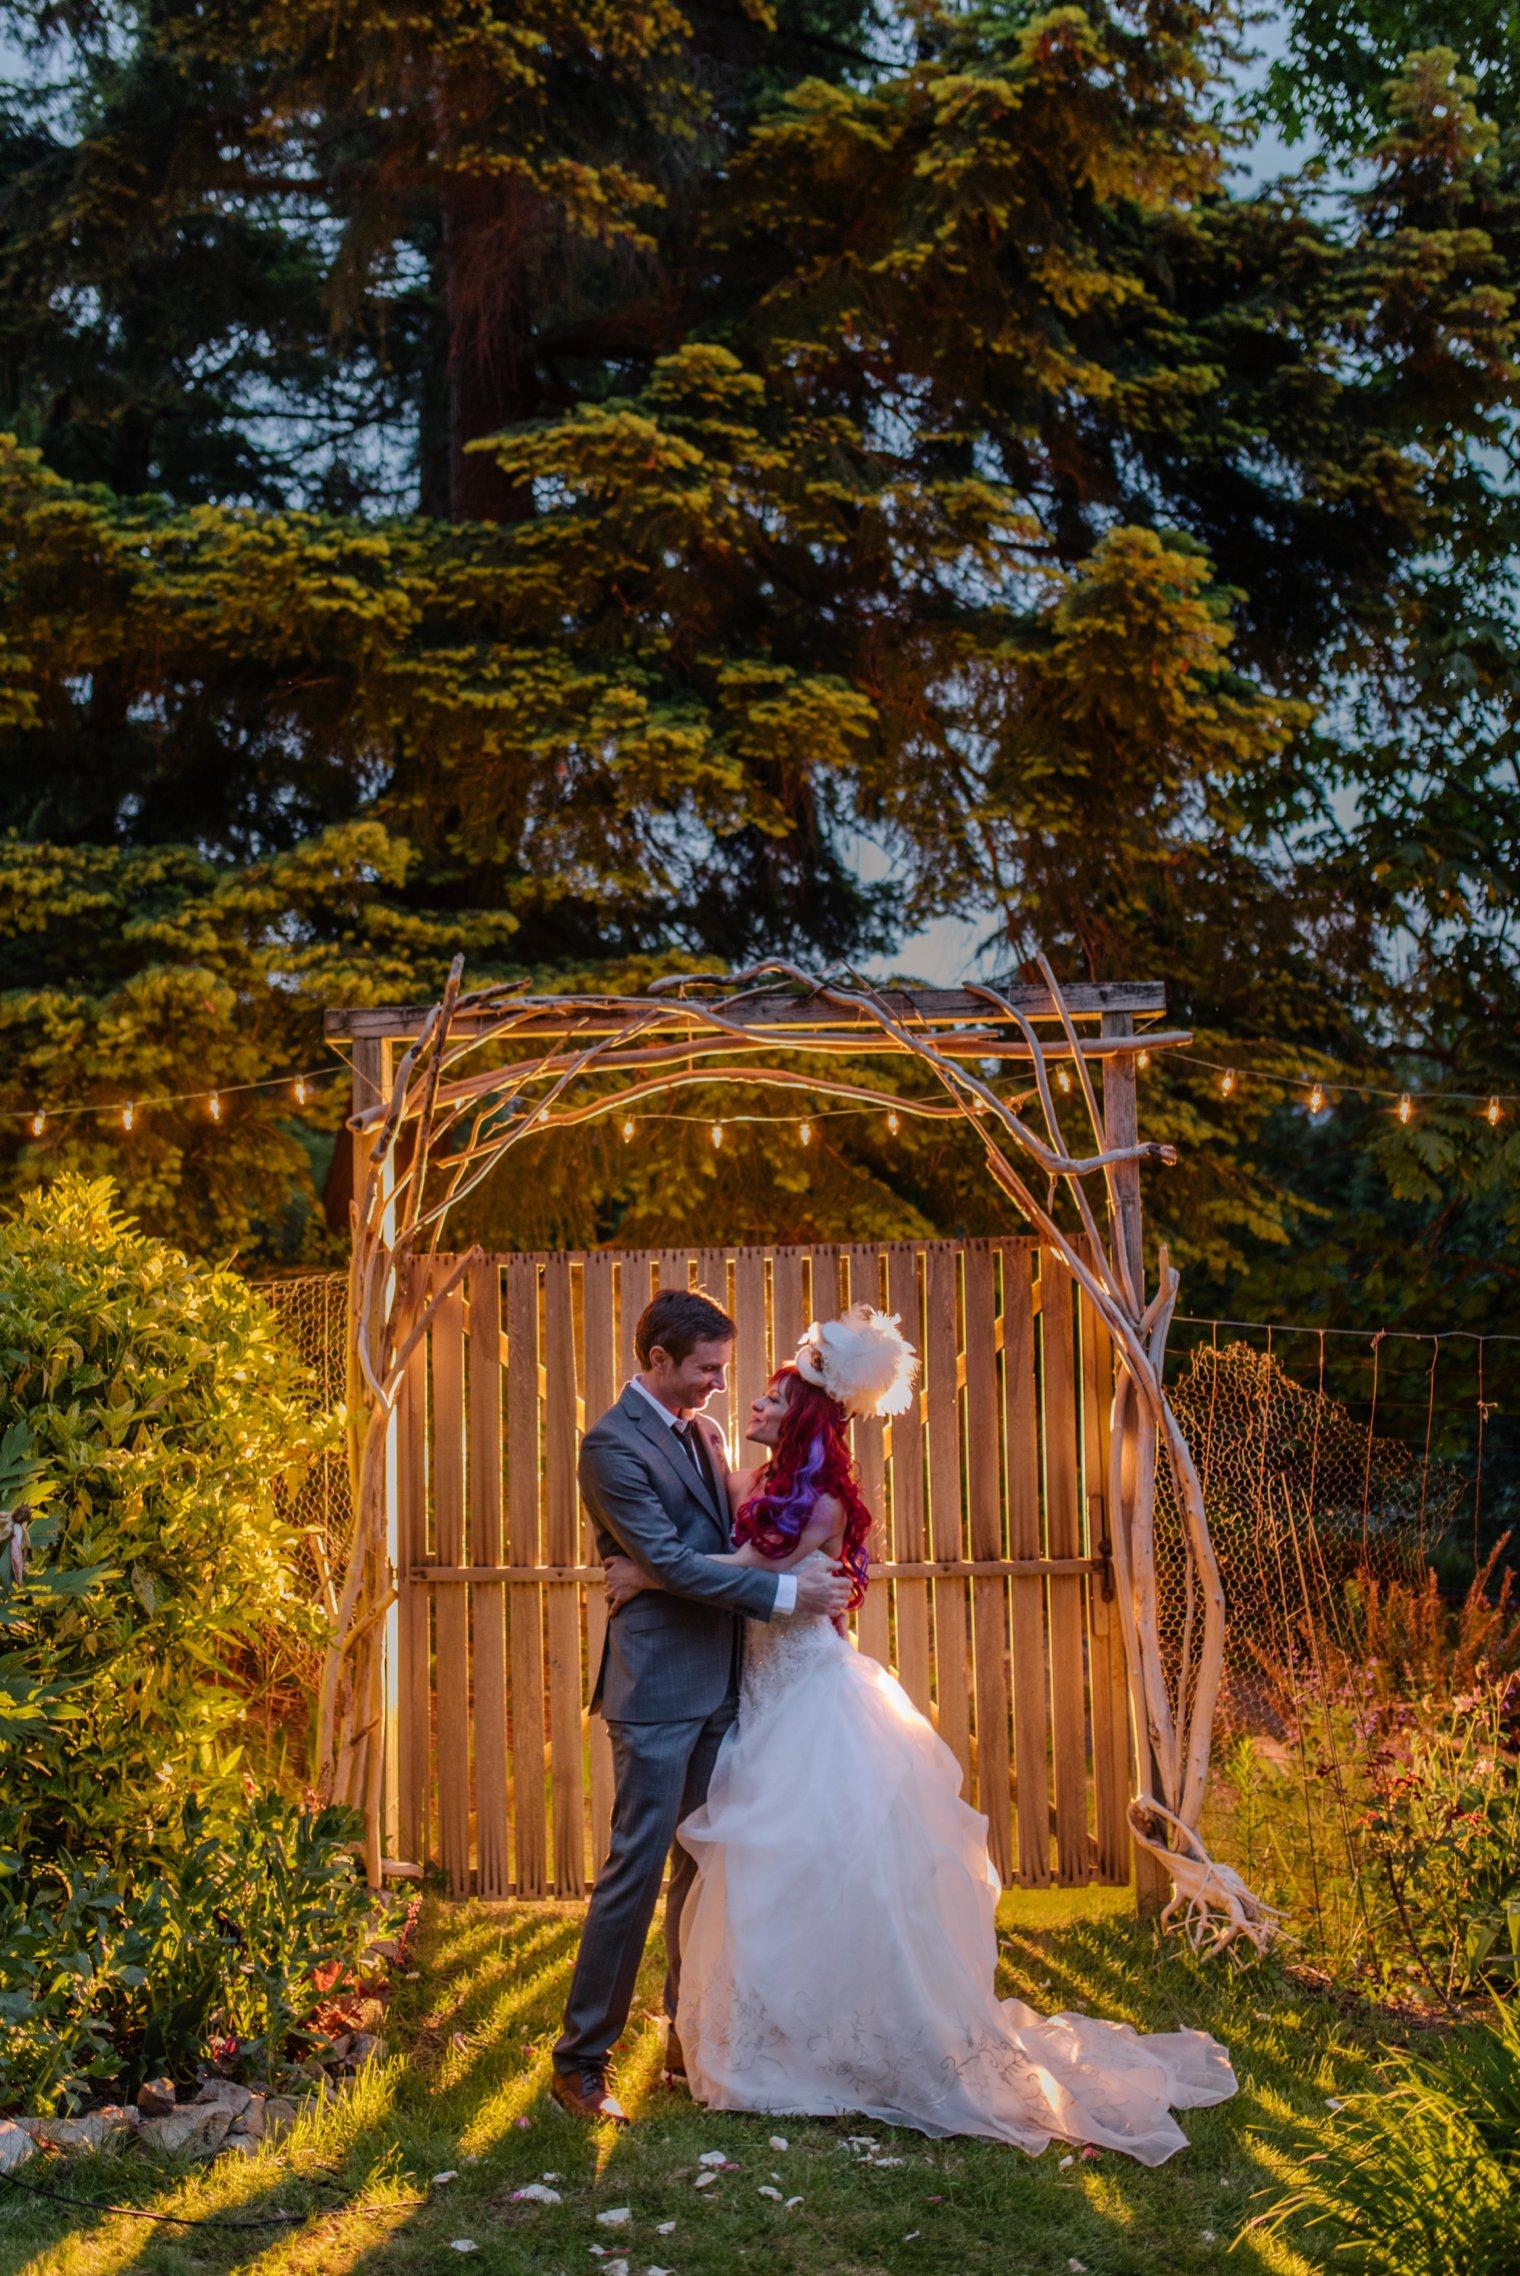 unique steampunk wedding photo